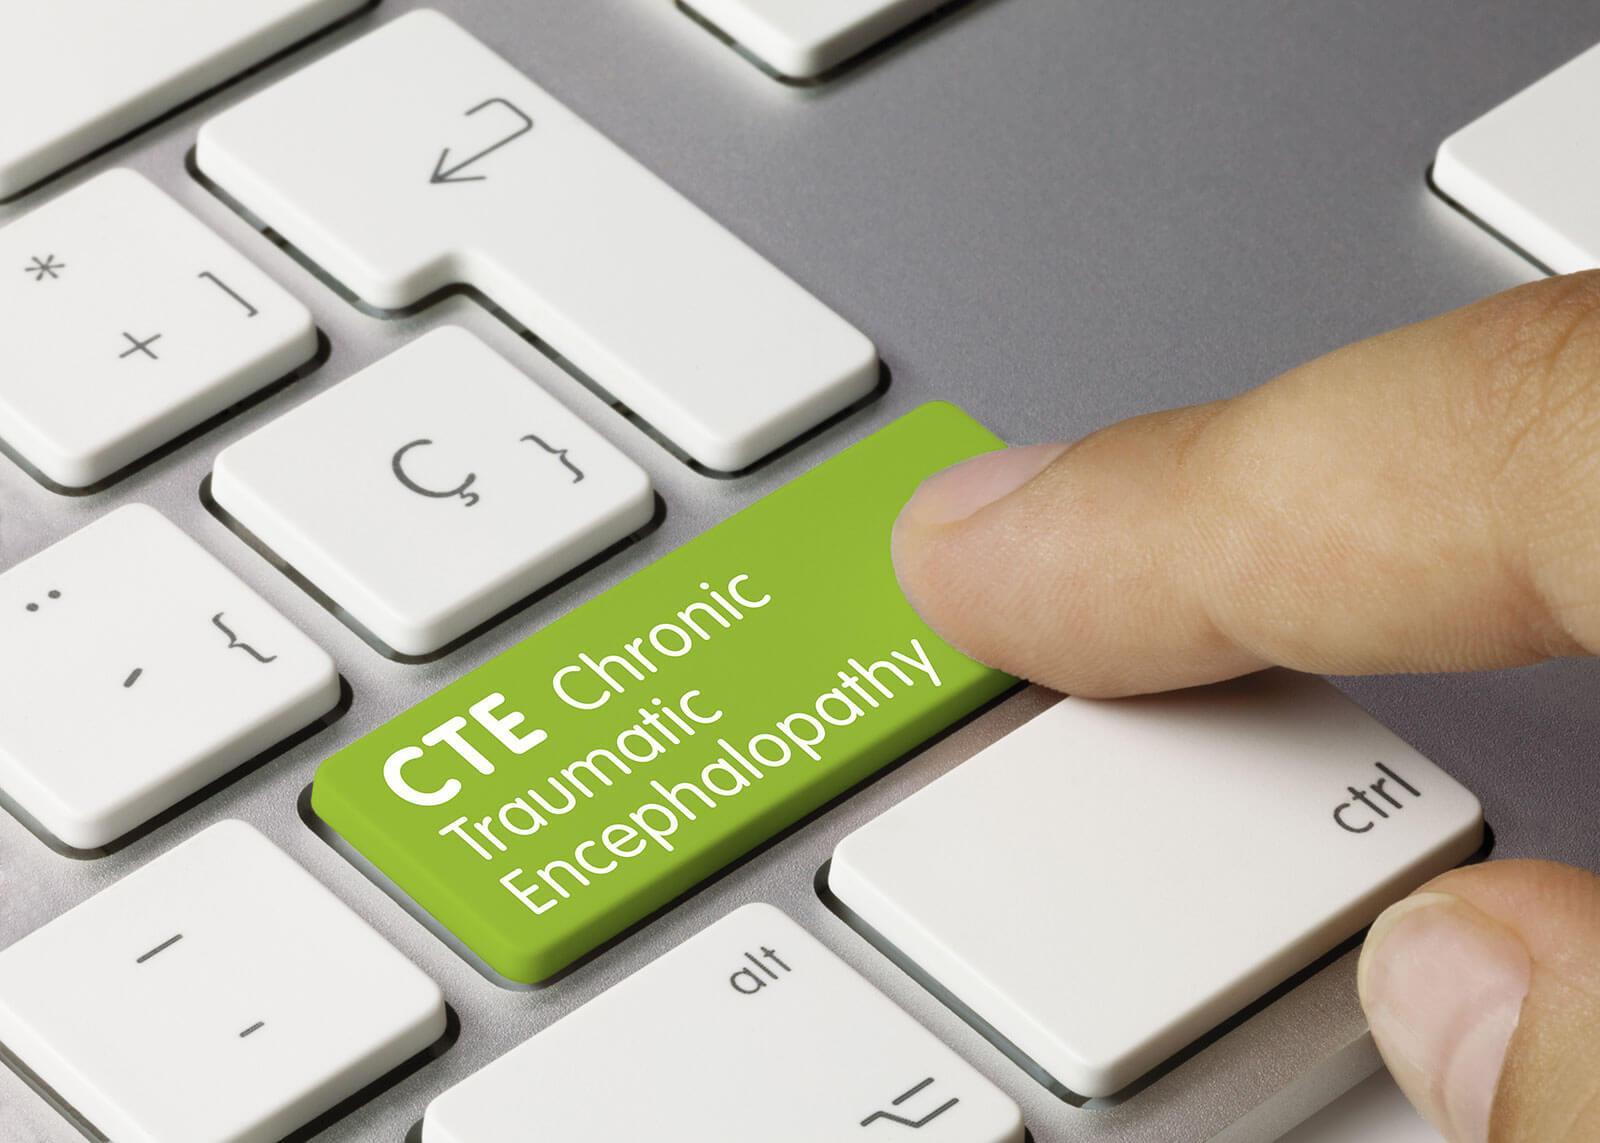 cte-image